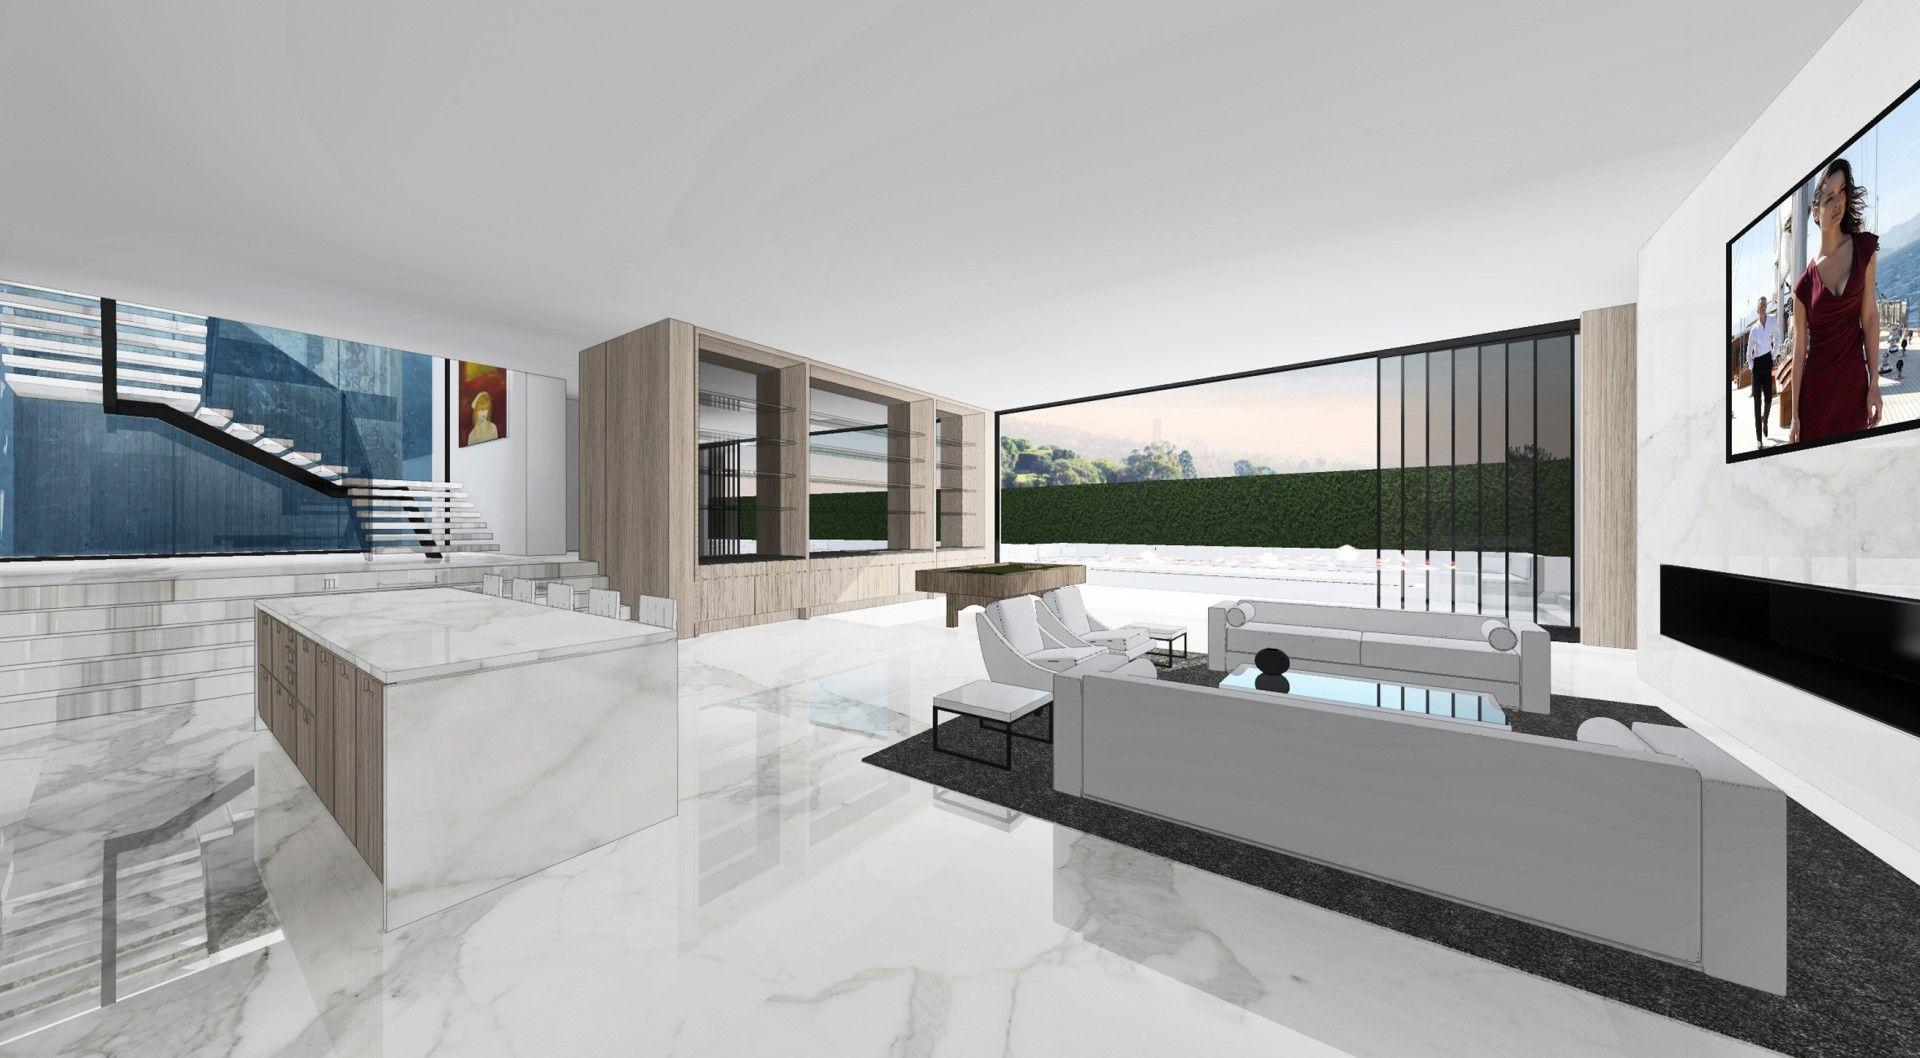 los angeles laguna beach architecture projects mcclean design